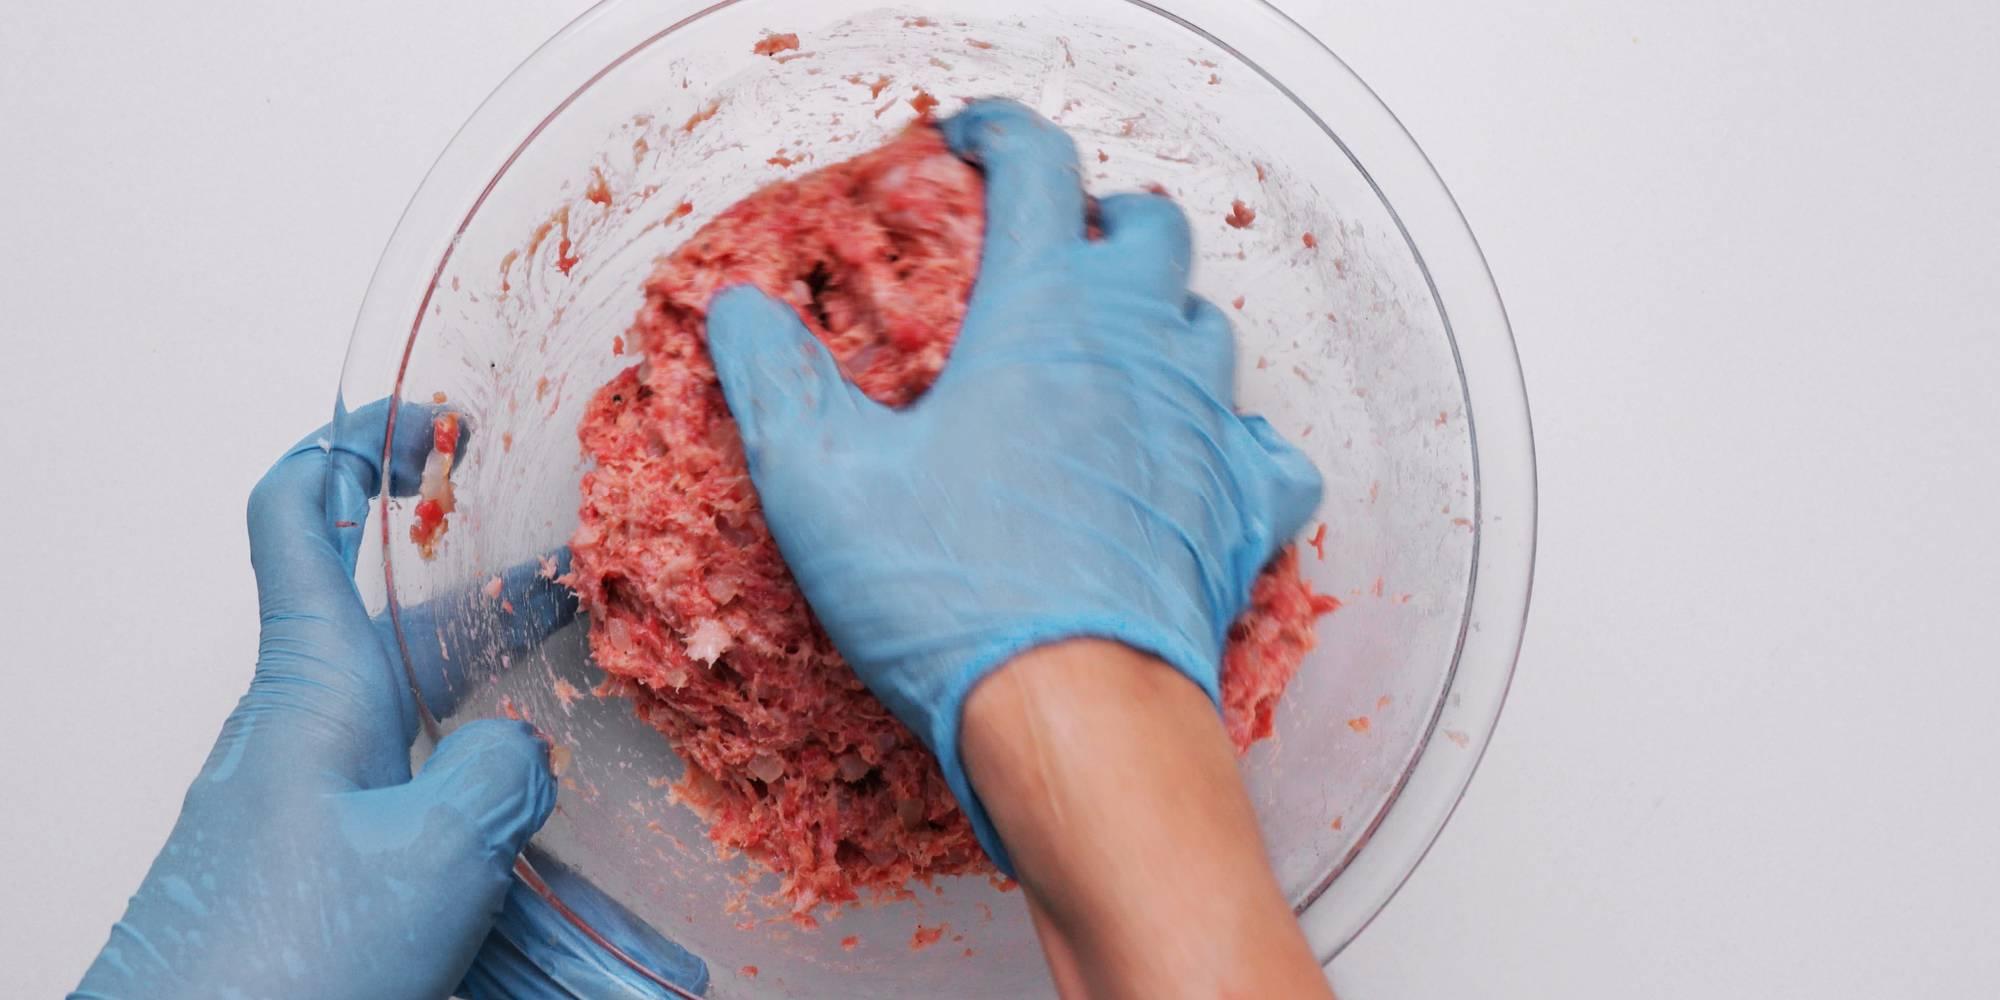 Mixing meat mixture for making Japanese Hamburger Steak.